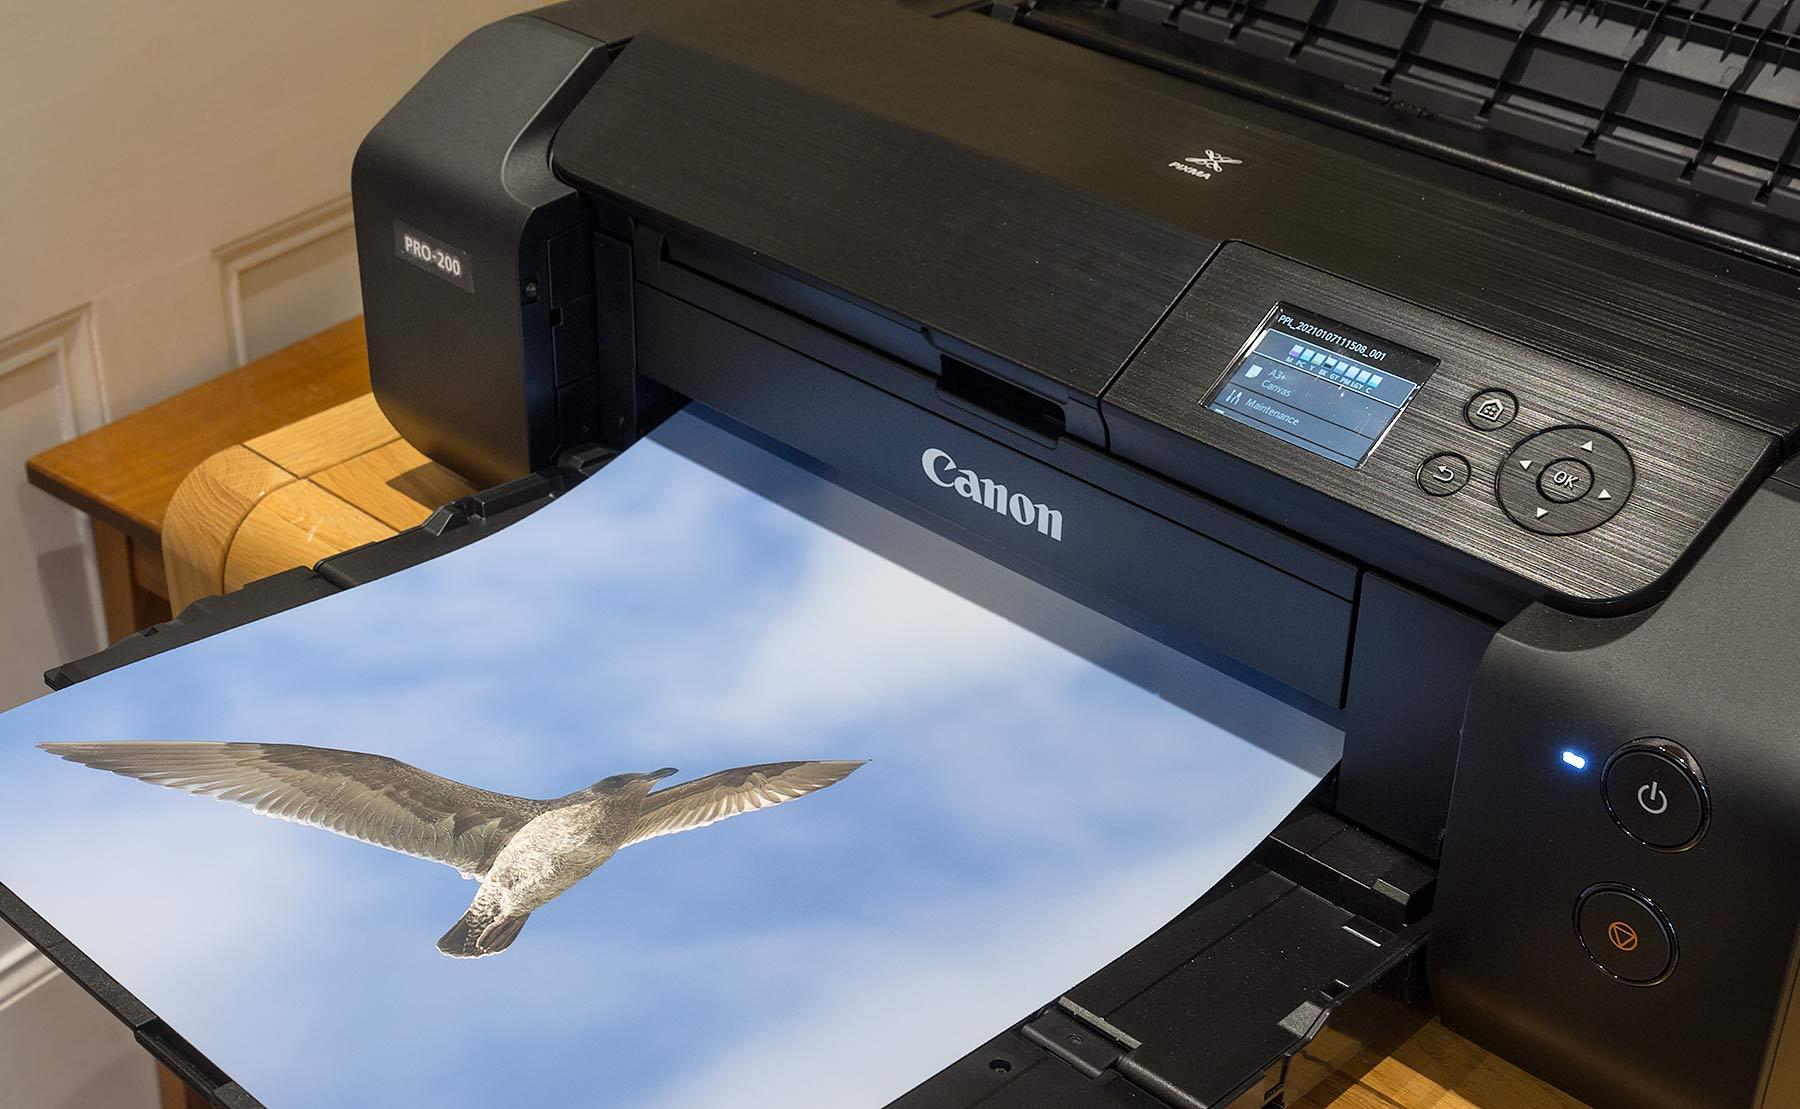 pro-200-printing